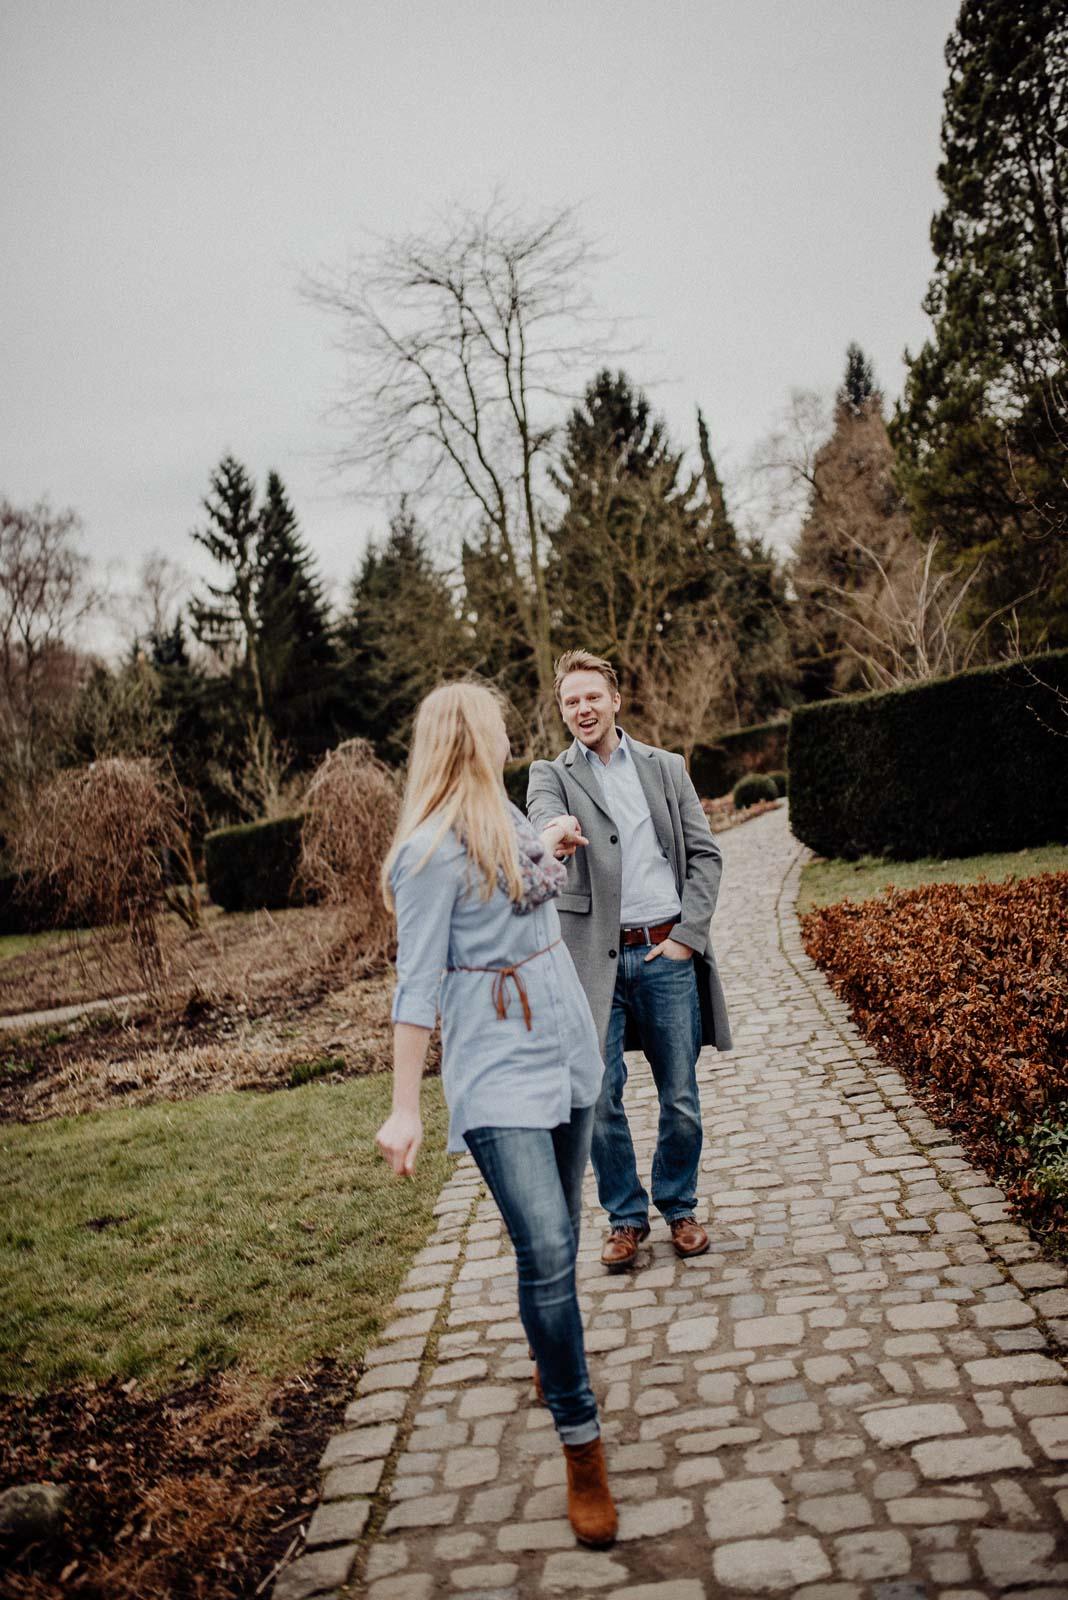 039-verlobungsshooting-engagement-fotograf-witten-rombergpark-dortmund